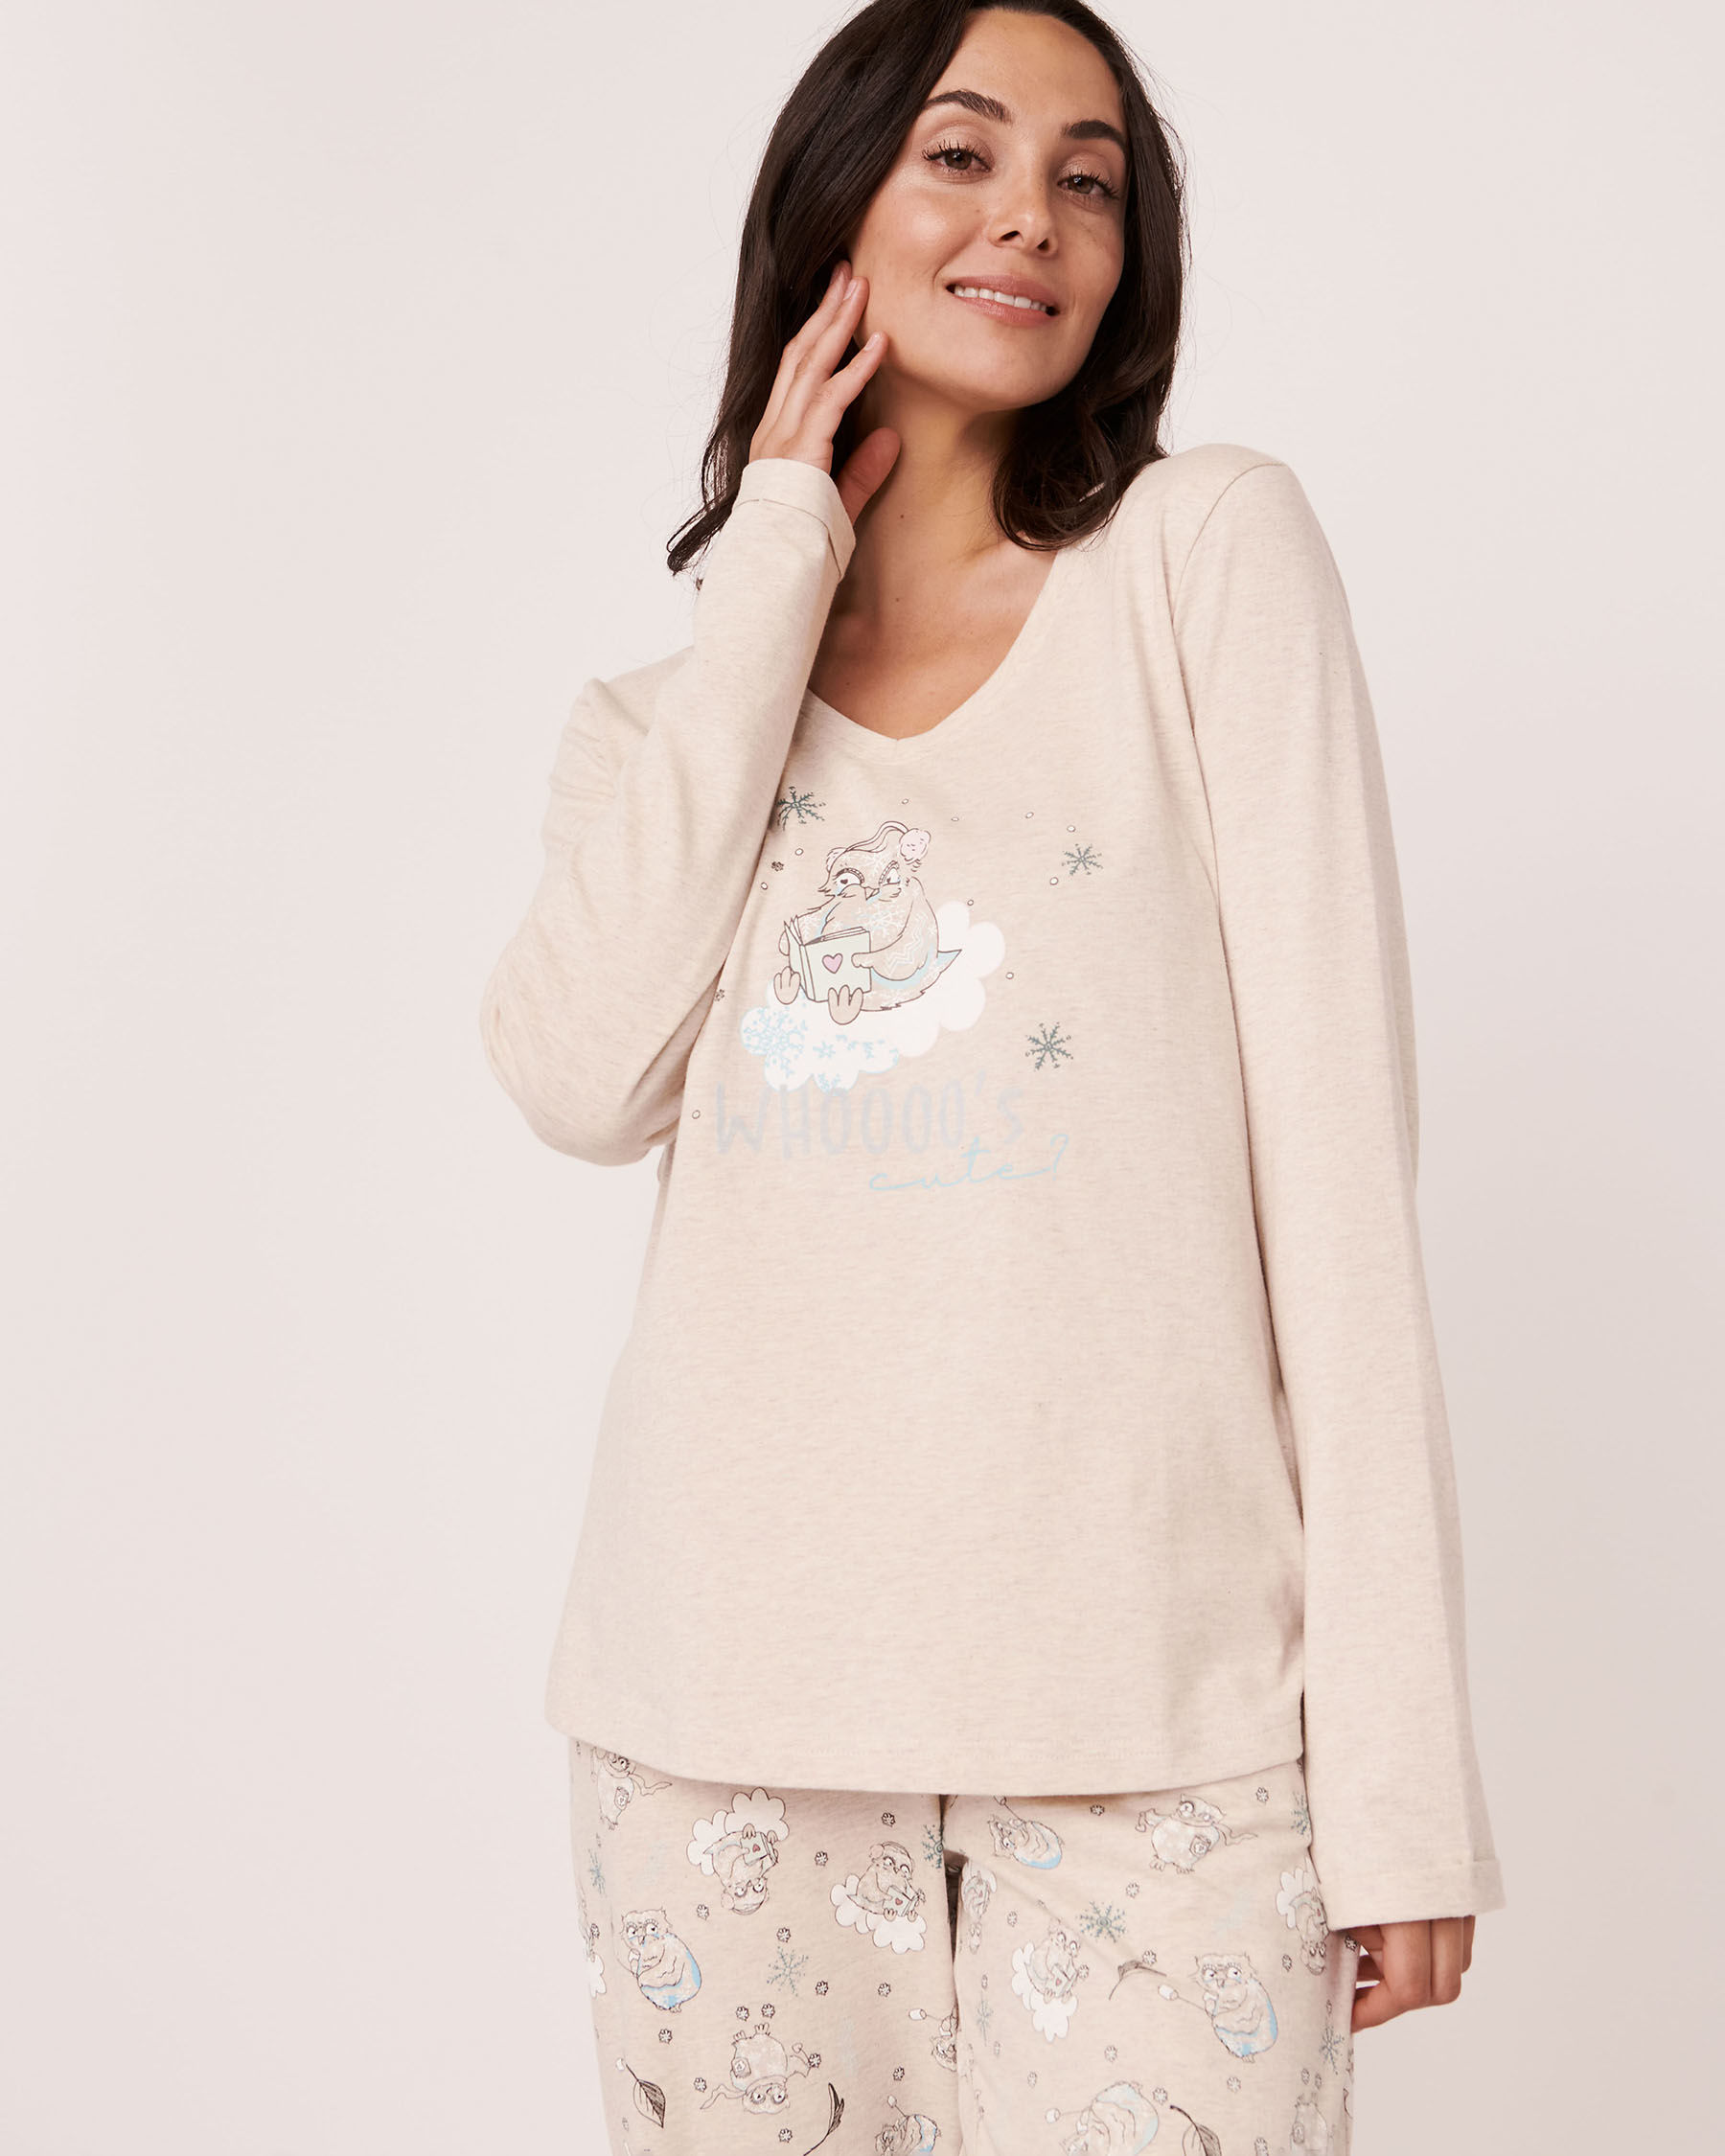 LA VIE EN ROSE Organic Cotton Long Sleeve Shirt Oatmeal 40100154 - View1